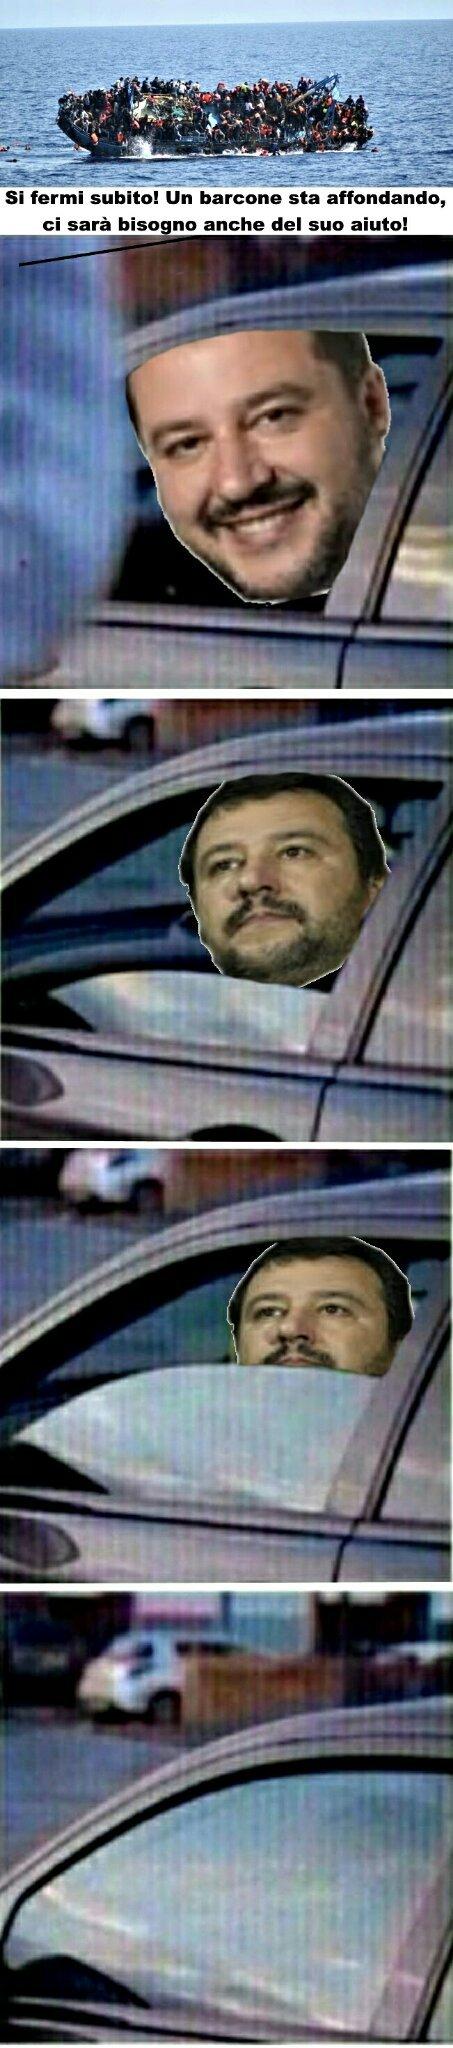 Salvini monelloh - meme